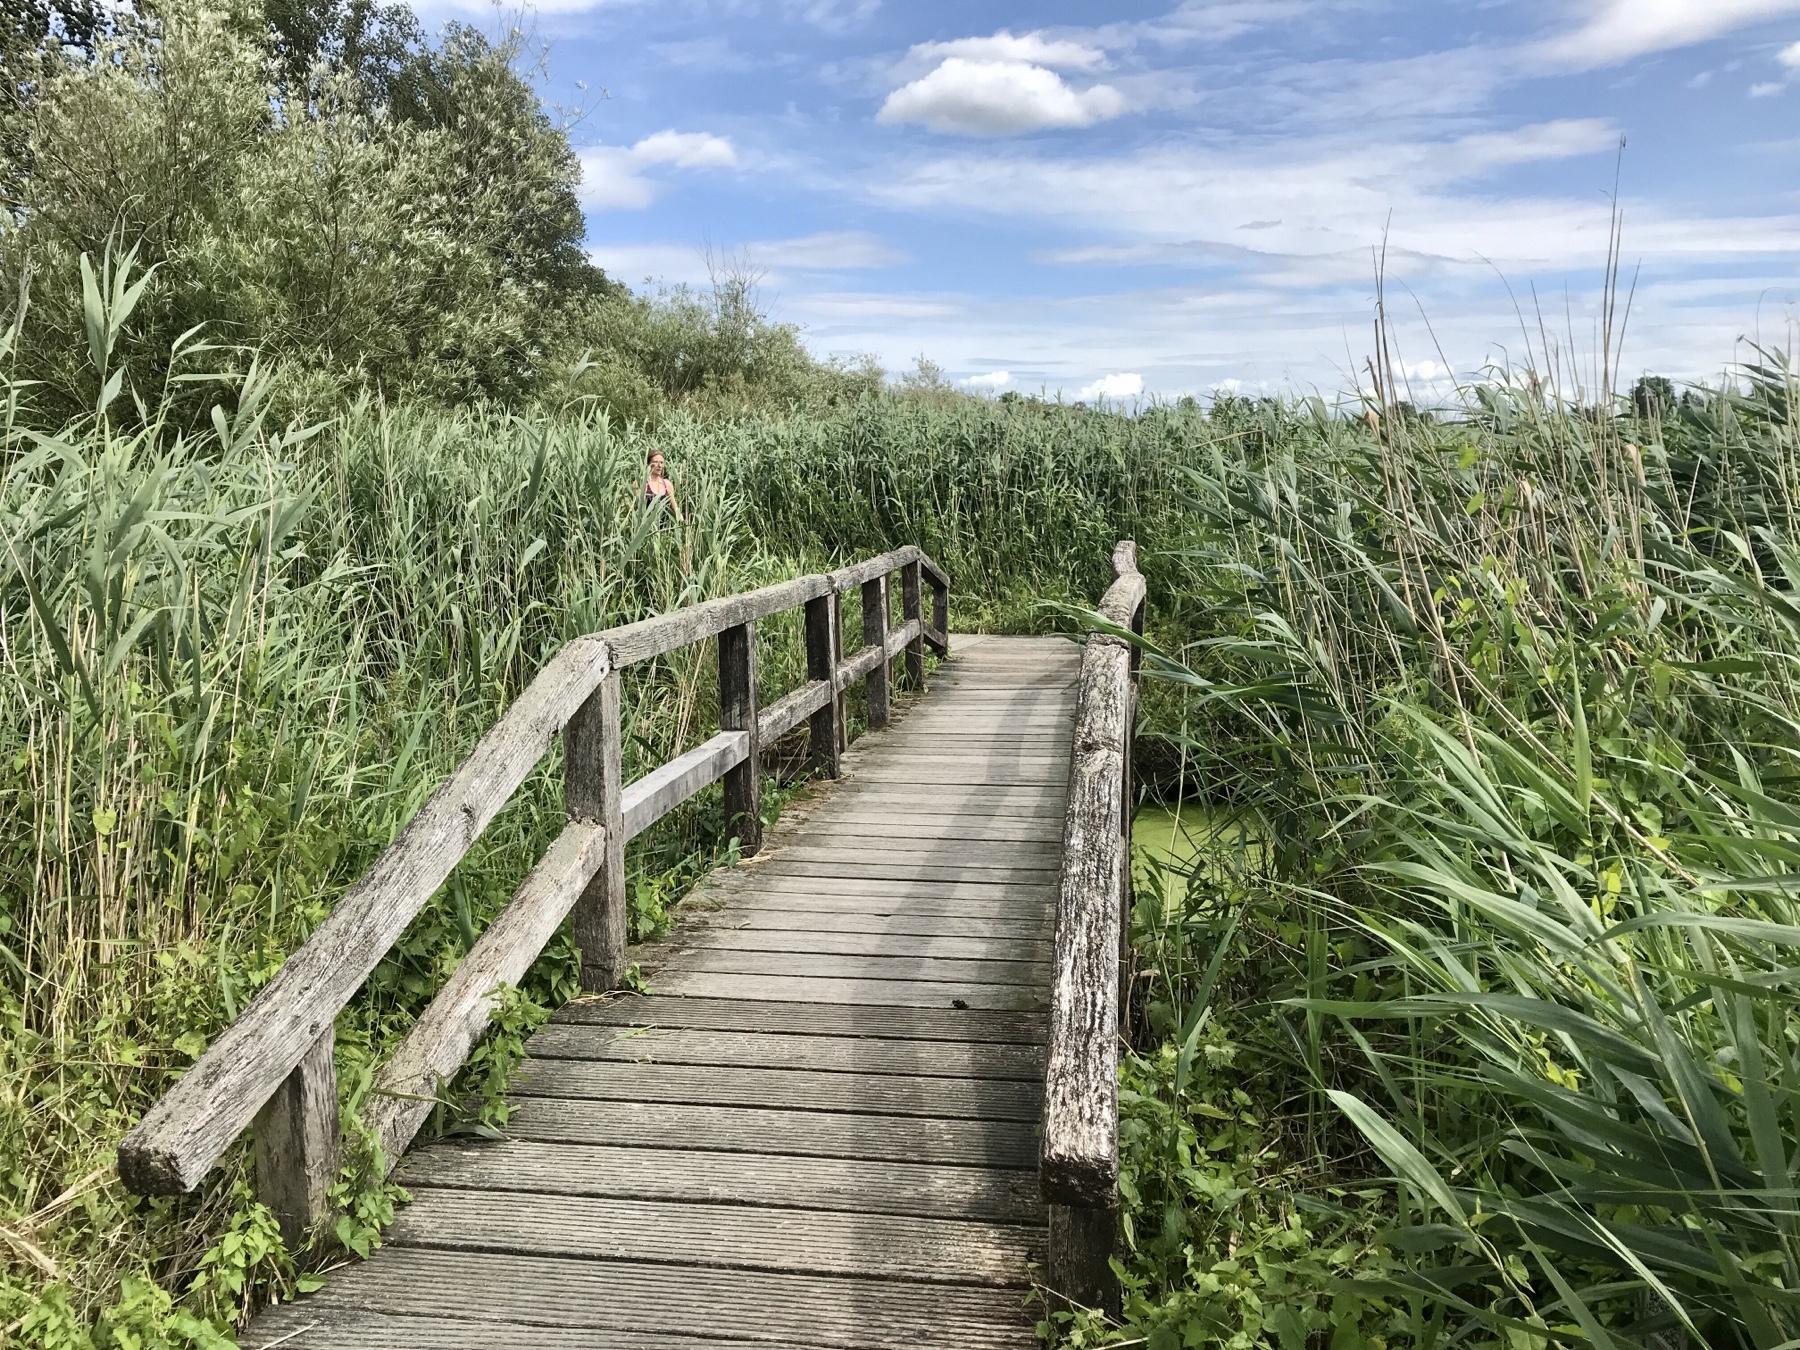 Brücke über die Trave, Stormarnweg nach Bad Oldesloe